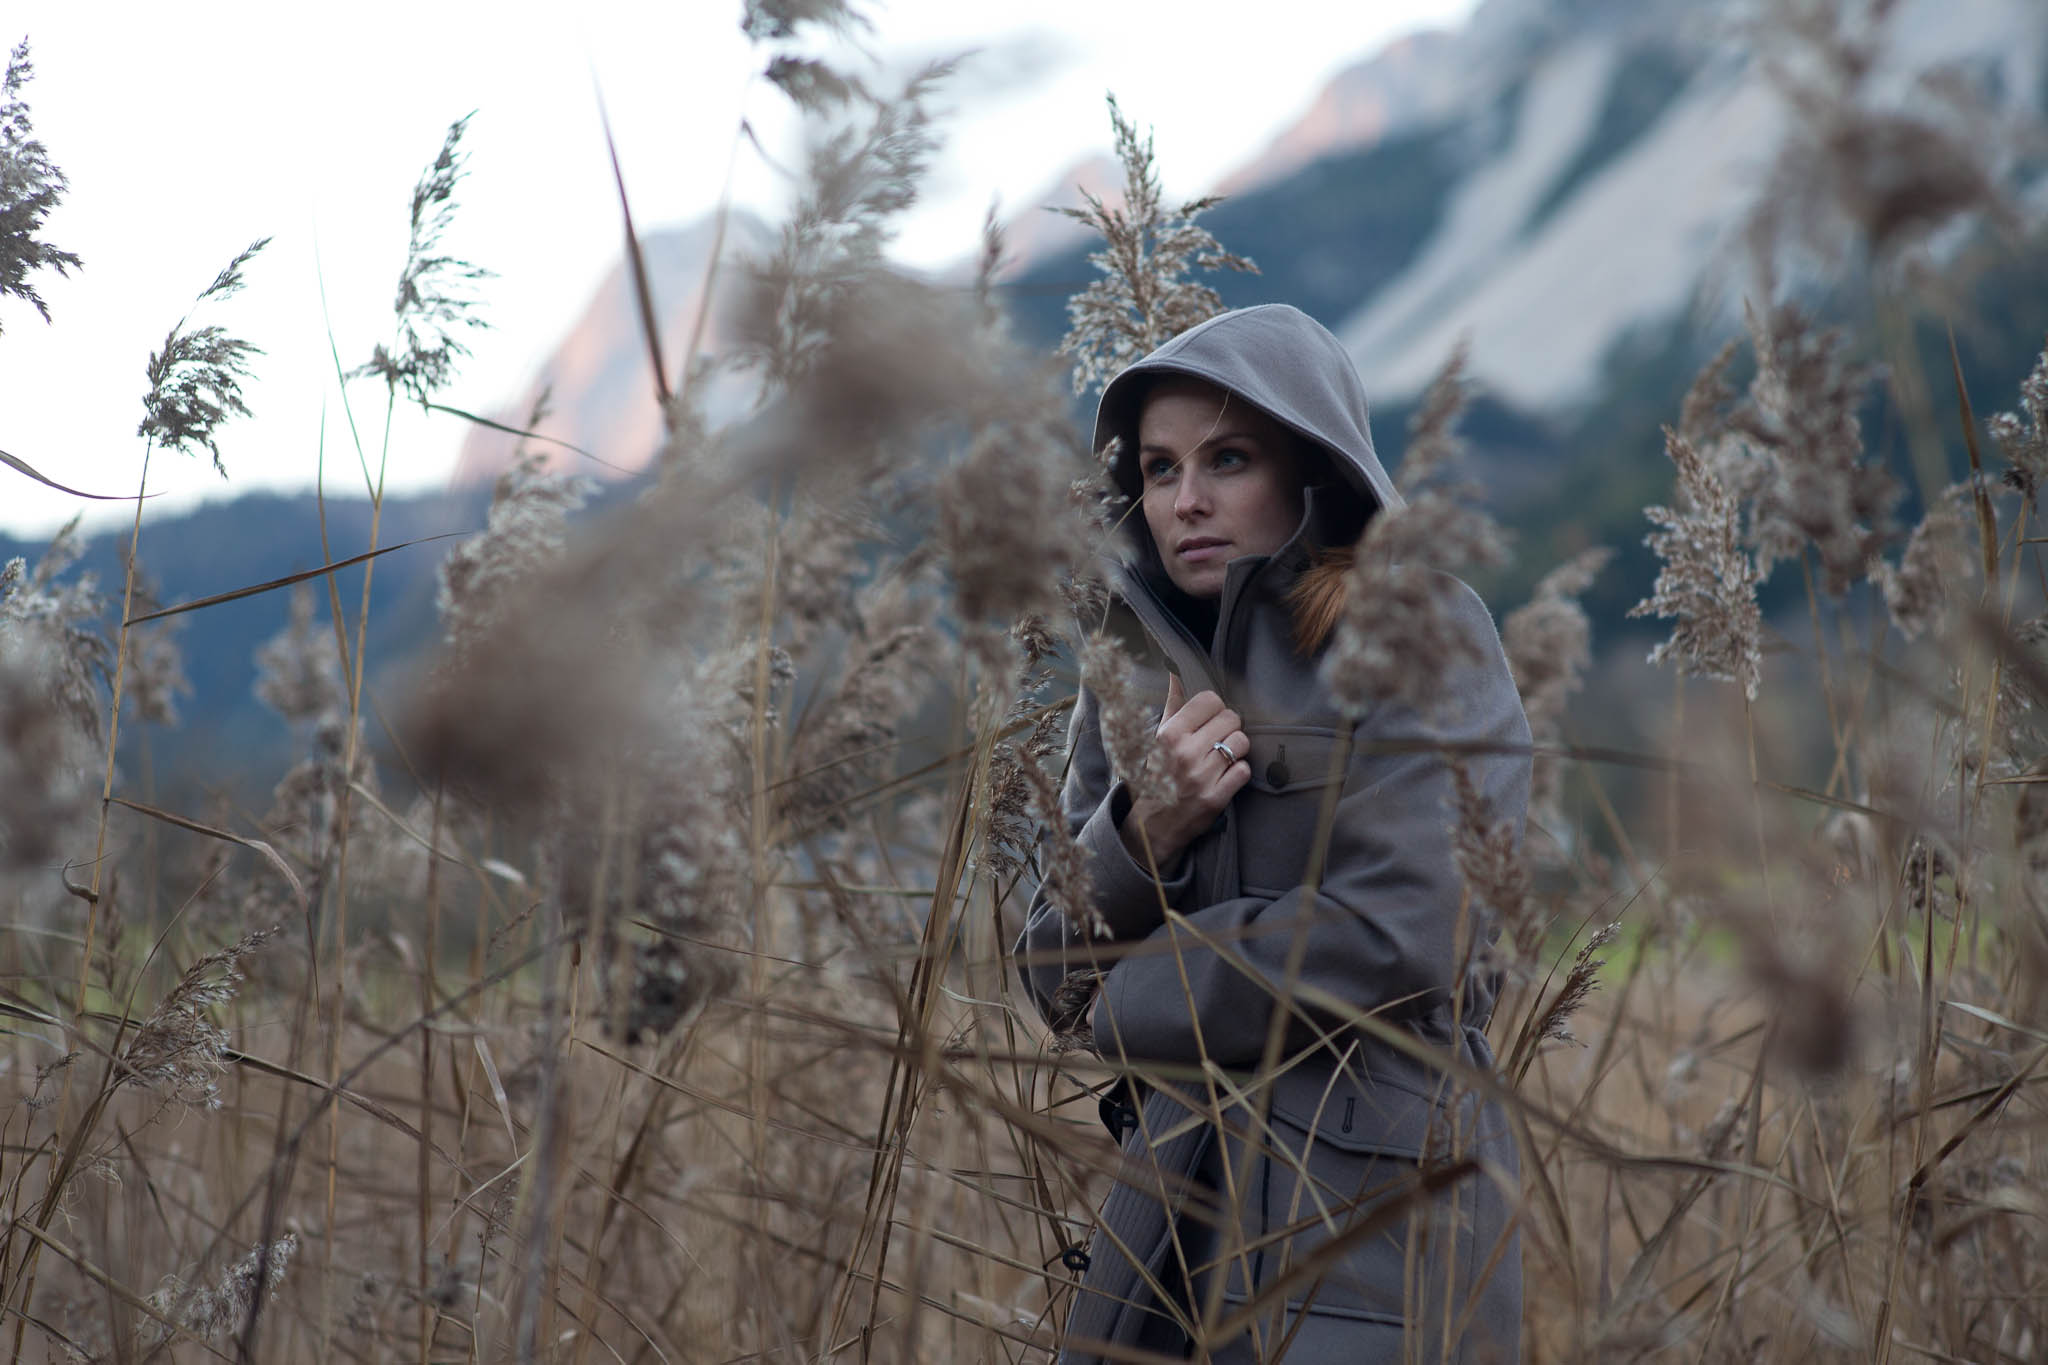 Lodenwalker – Image Photographie – Herbst 2015